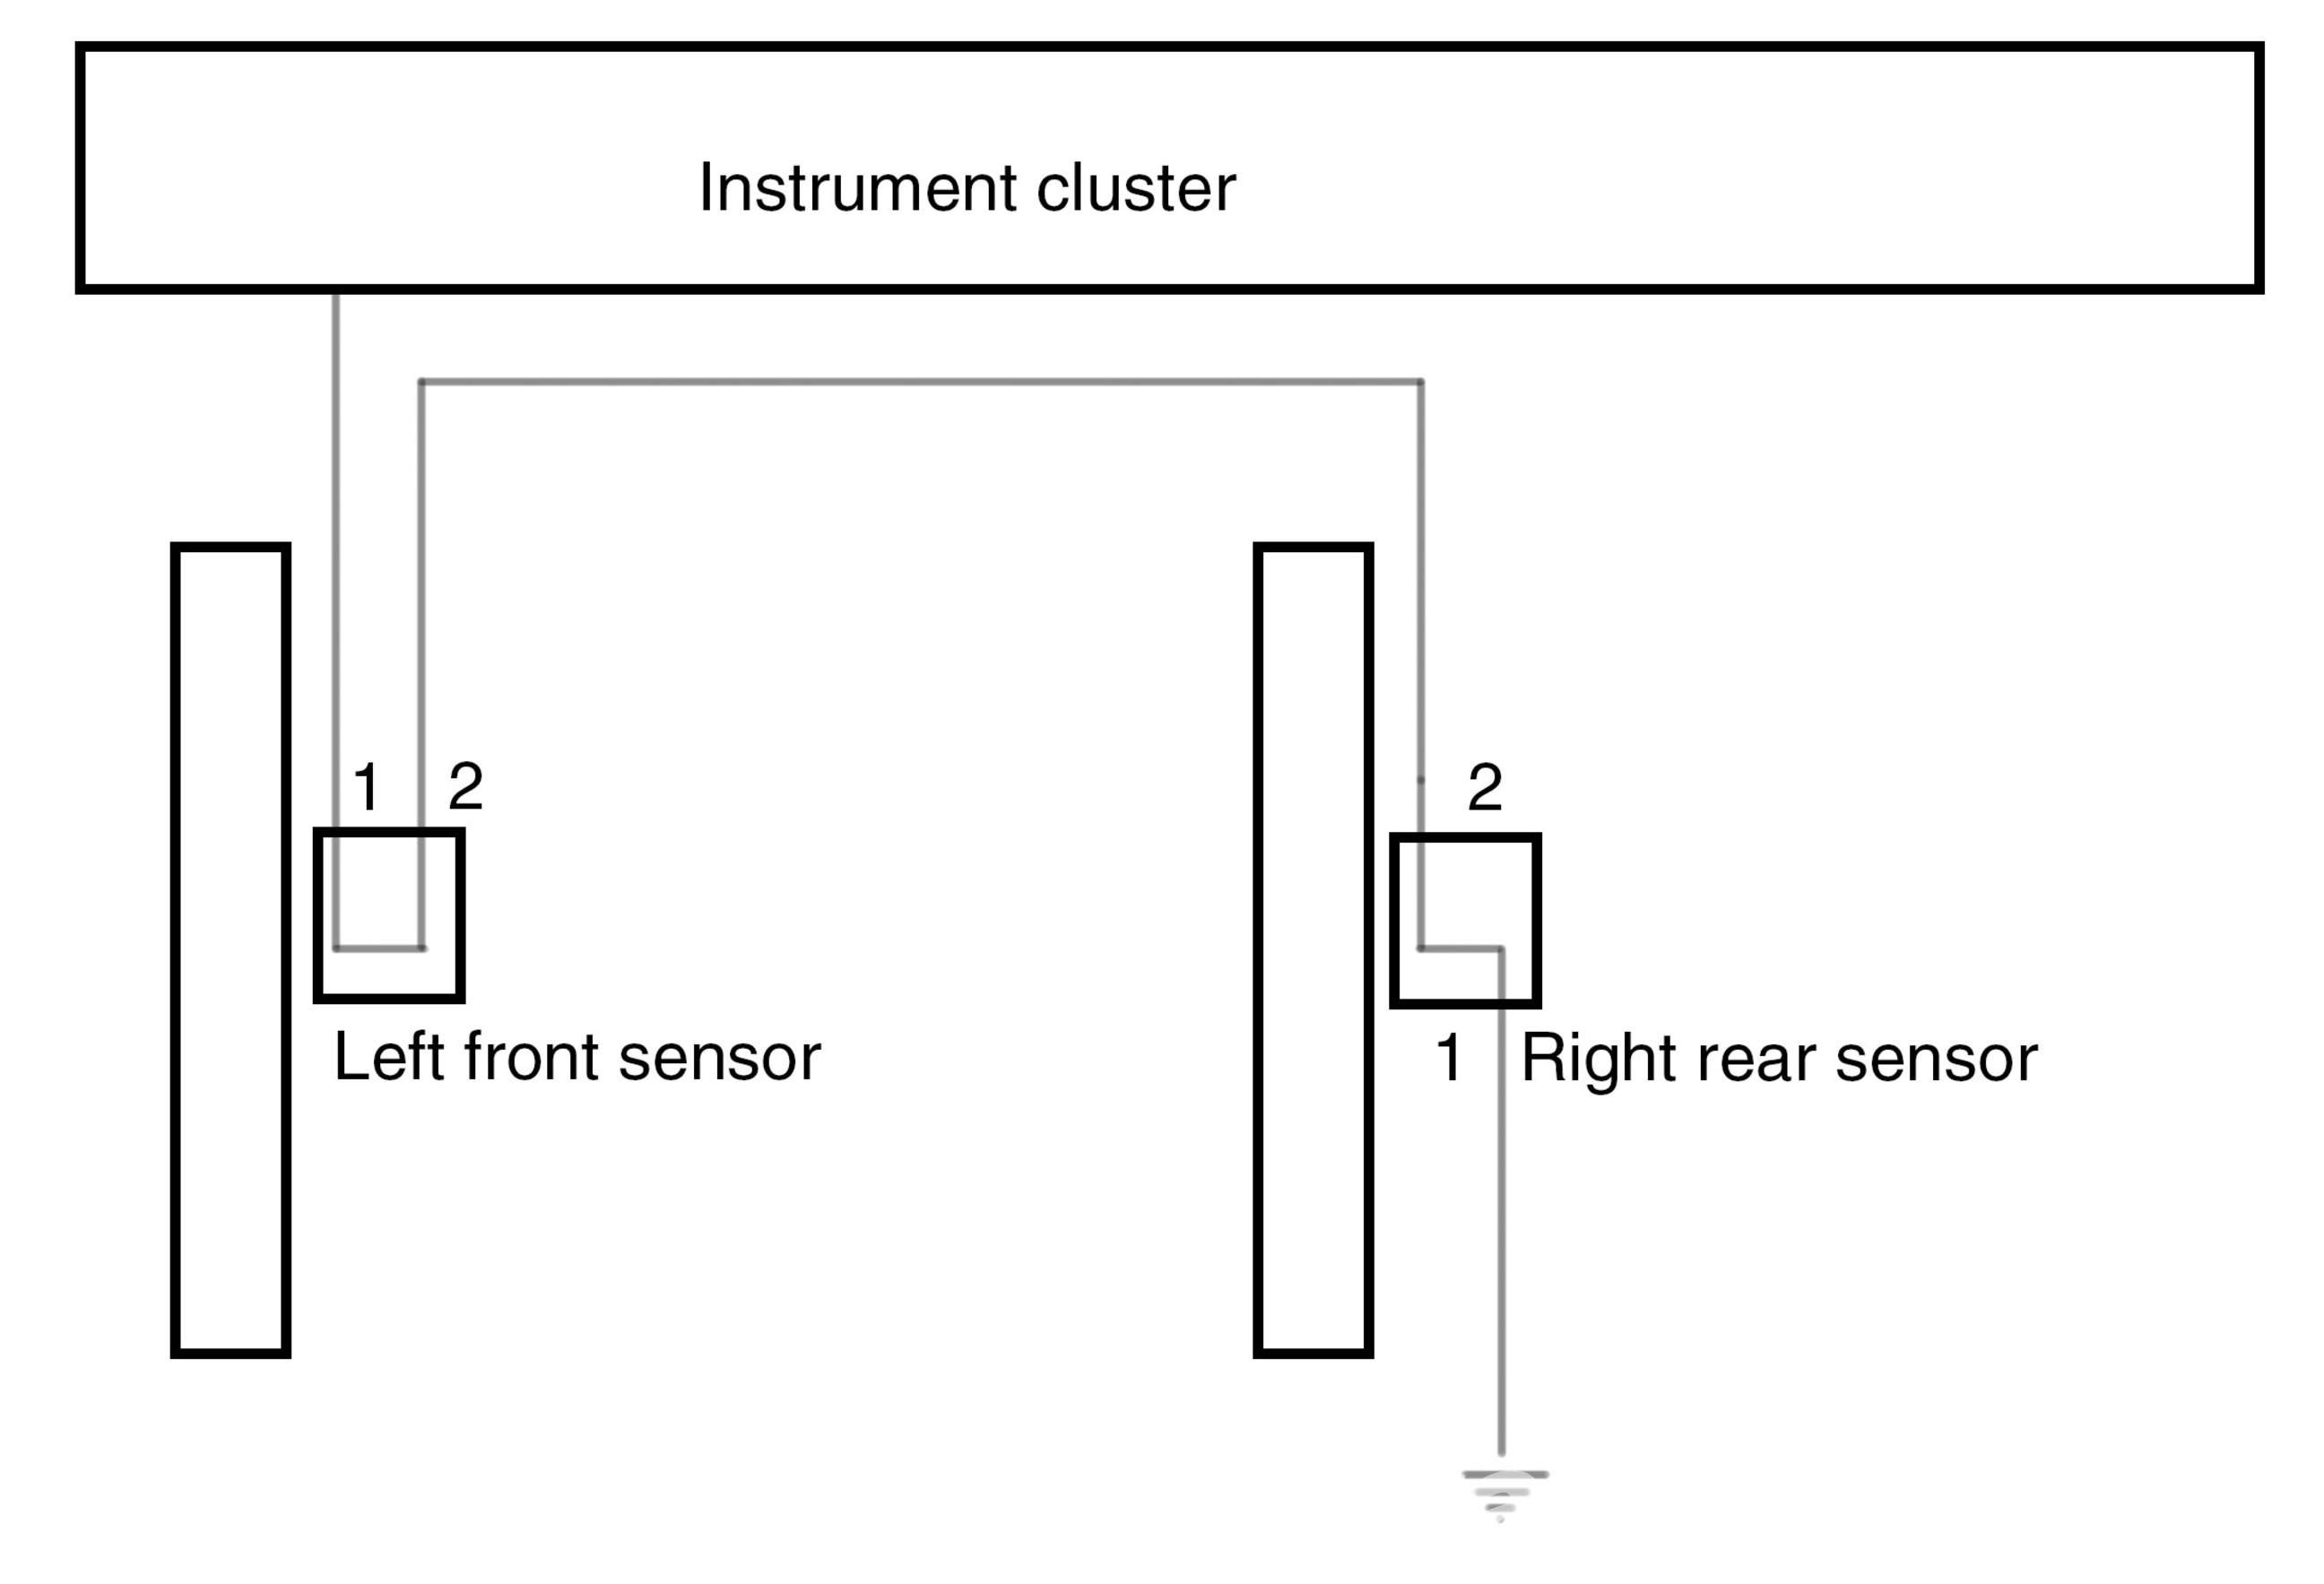 bmw e60 instrument cluster wiring diagram 04 bmw x3 wiring diagrams wiring diagram  04 bmw x3 wiring diagrams wiring diagram